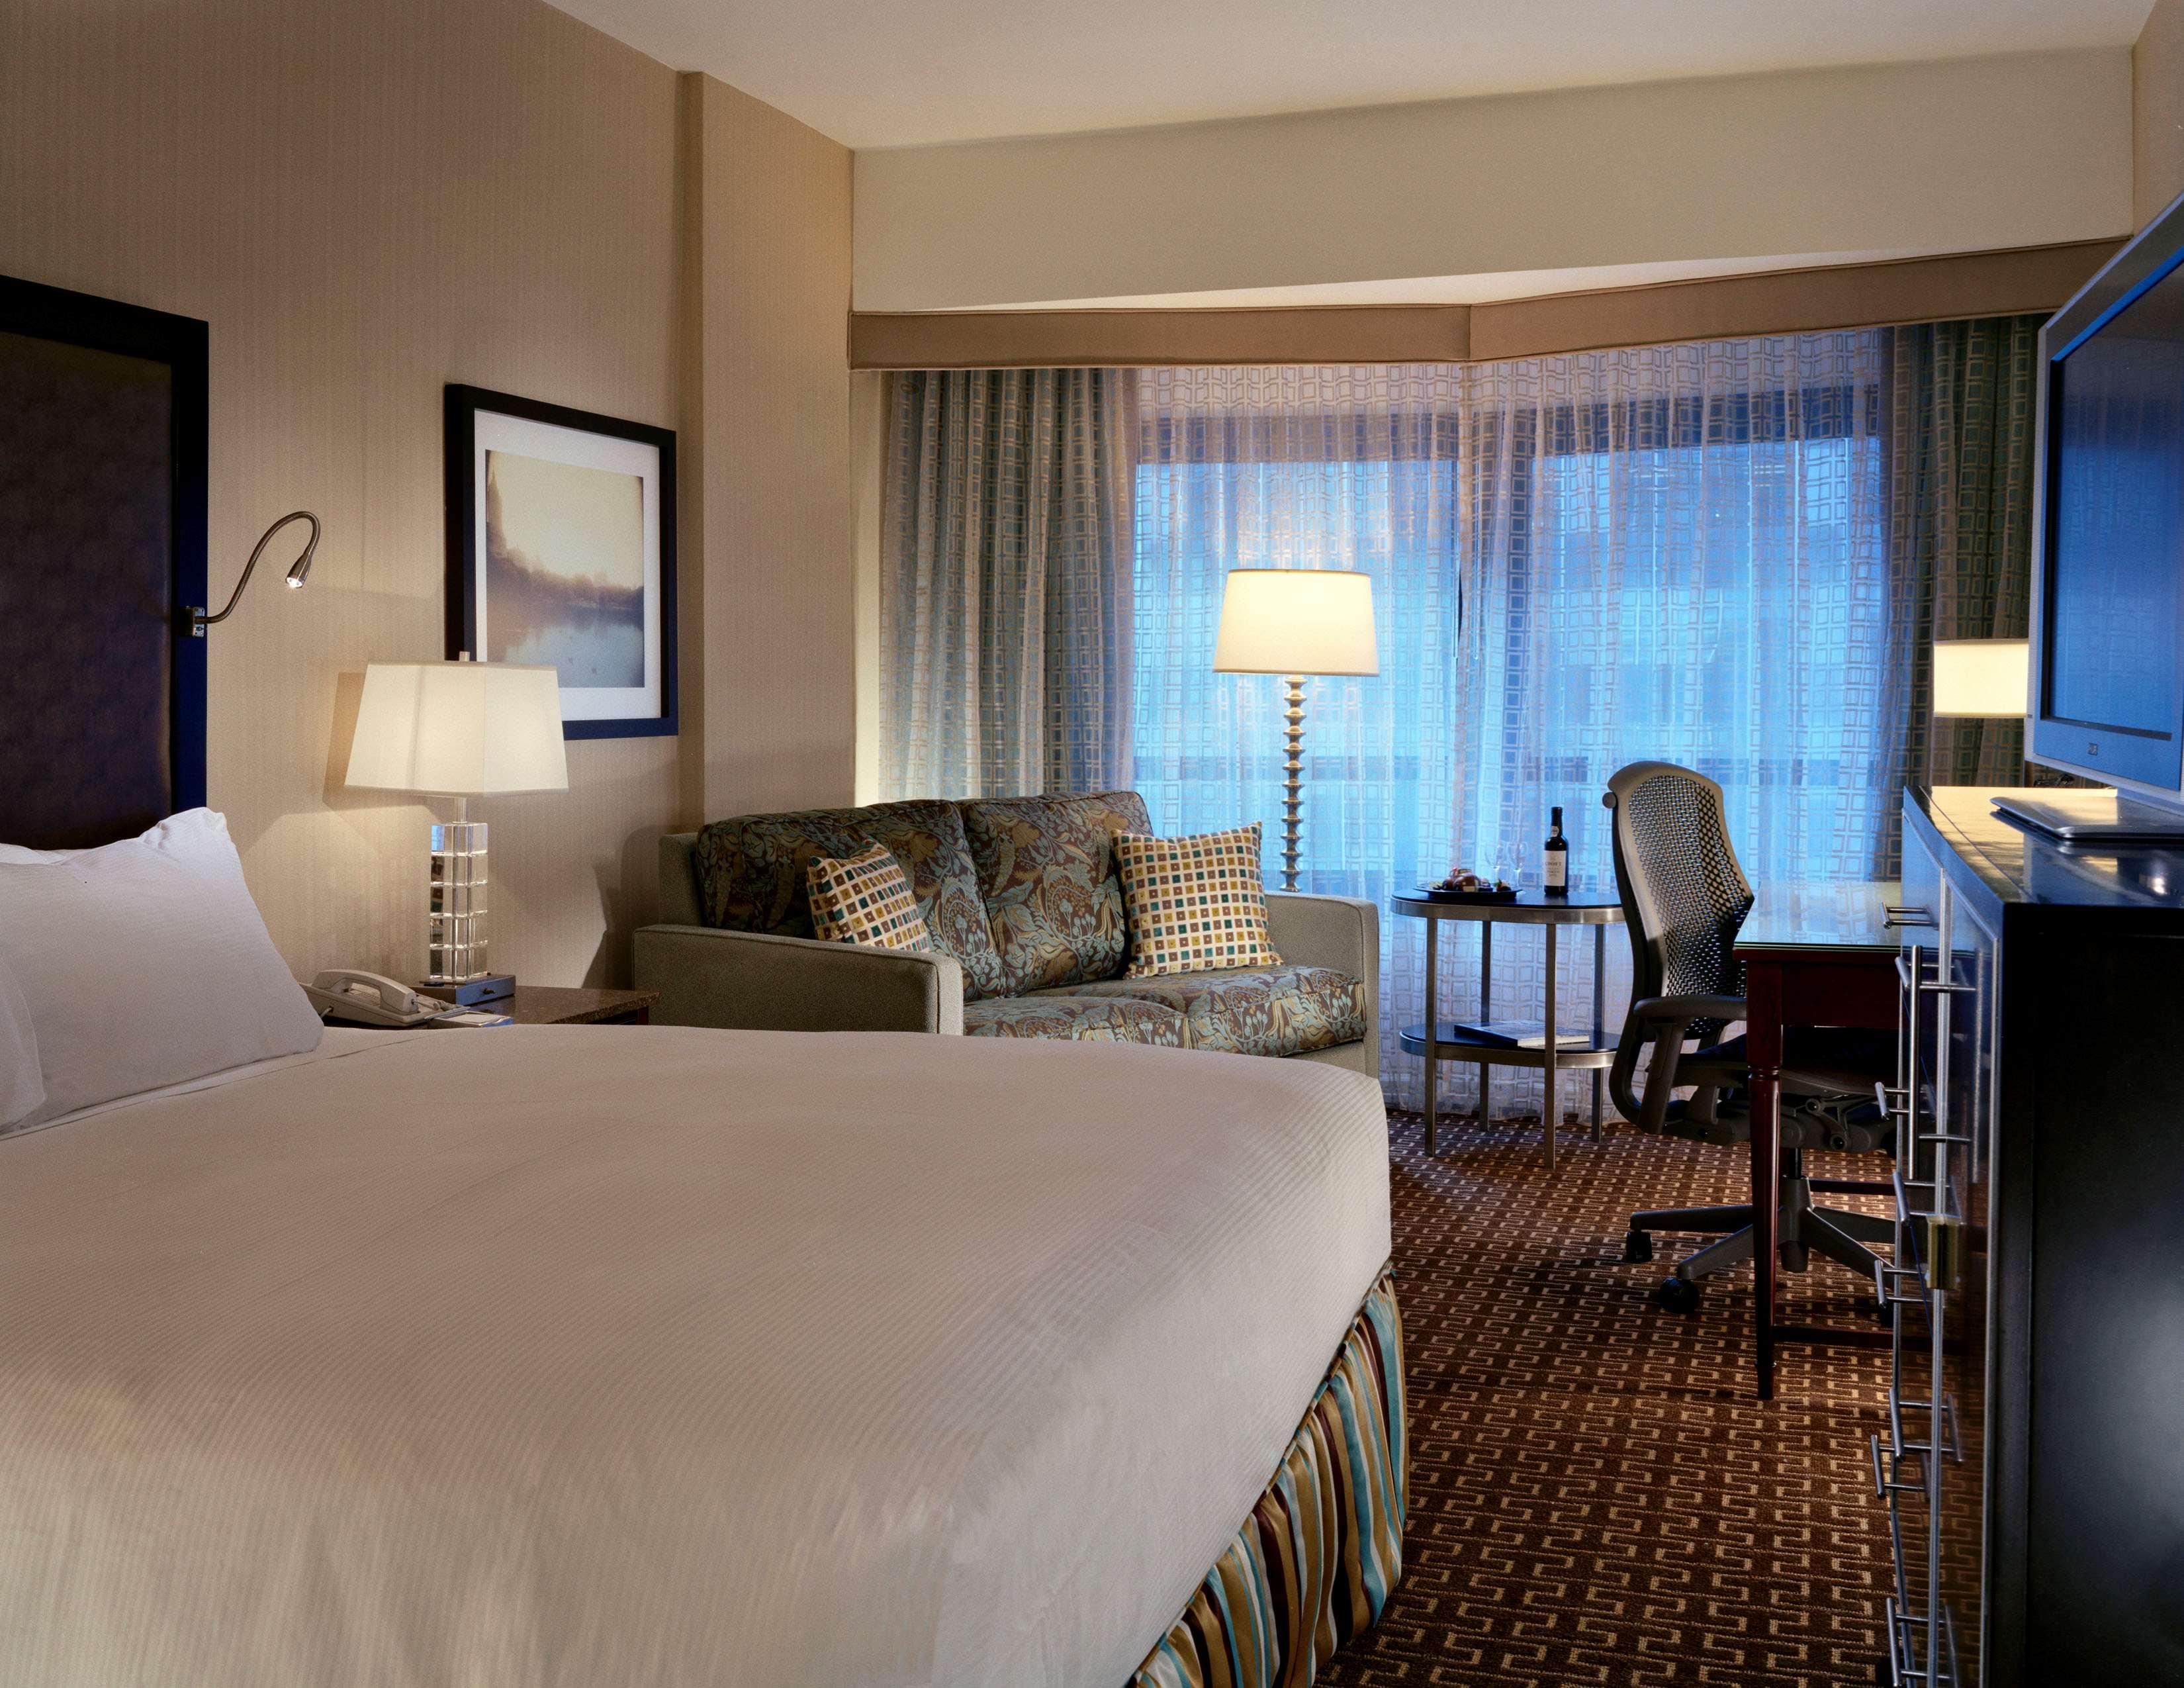 New York Hilton Midtown image 22